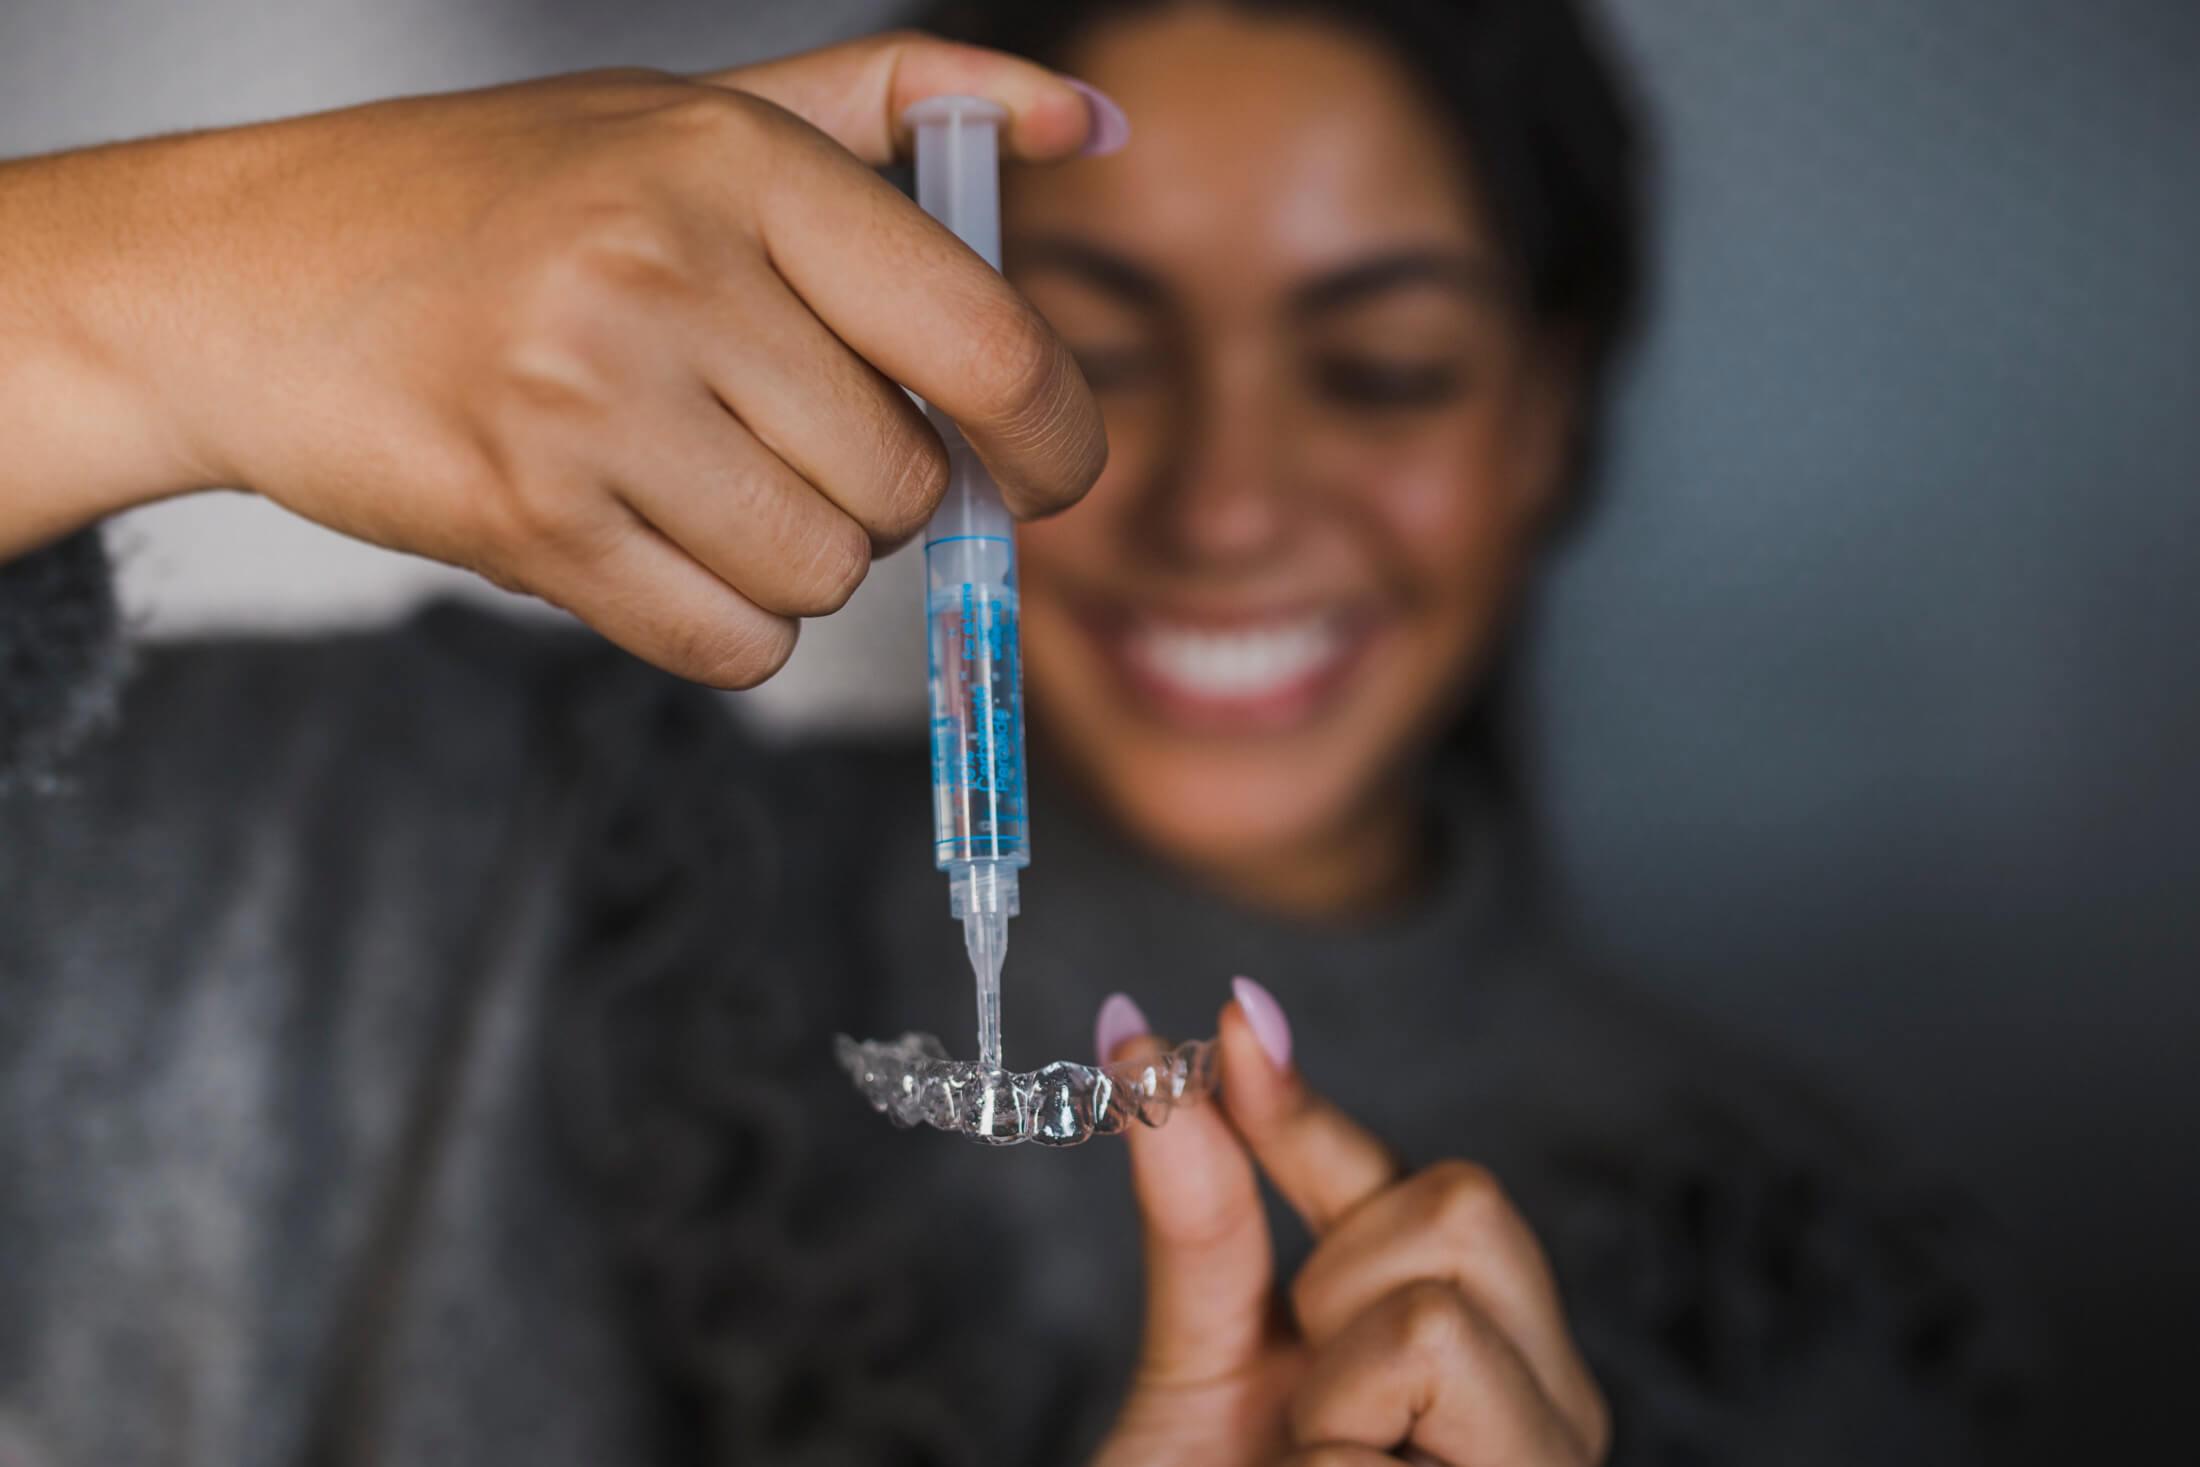 Whiter teeth using safe, dentist prescribed whitening gel